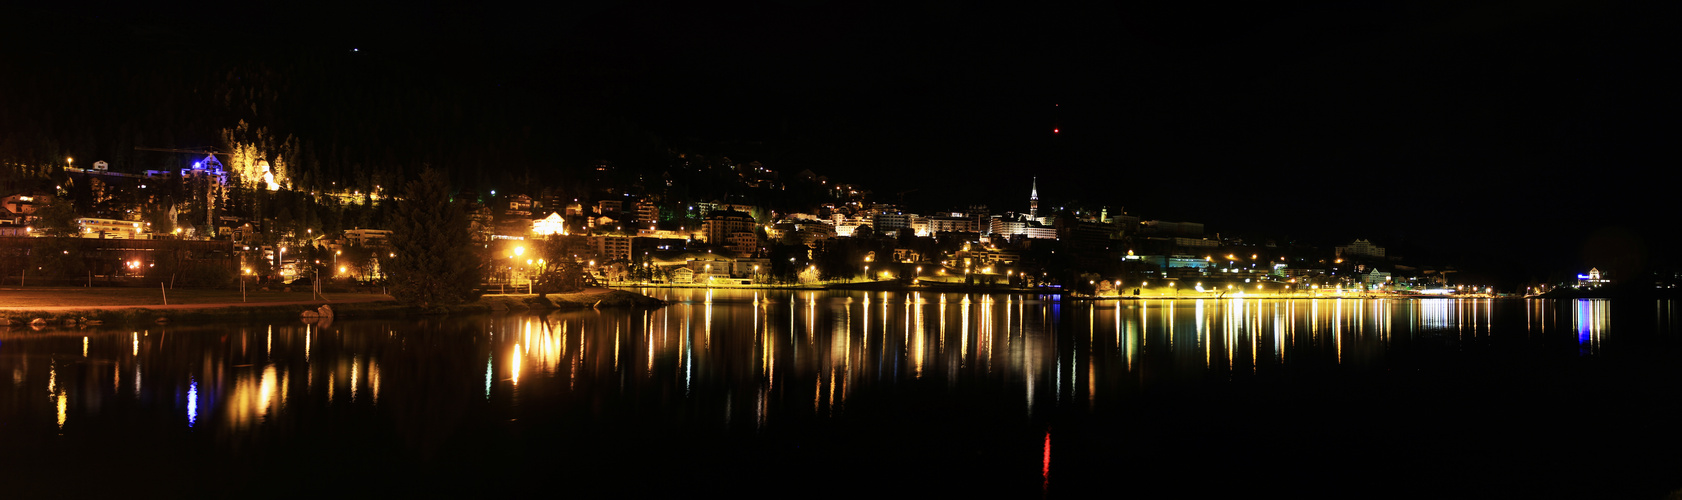 St.Moritz by night